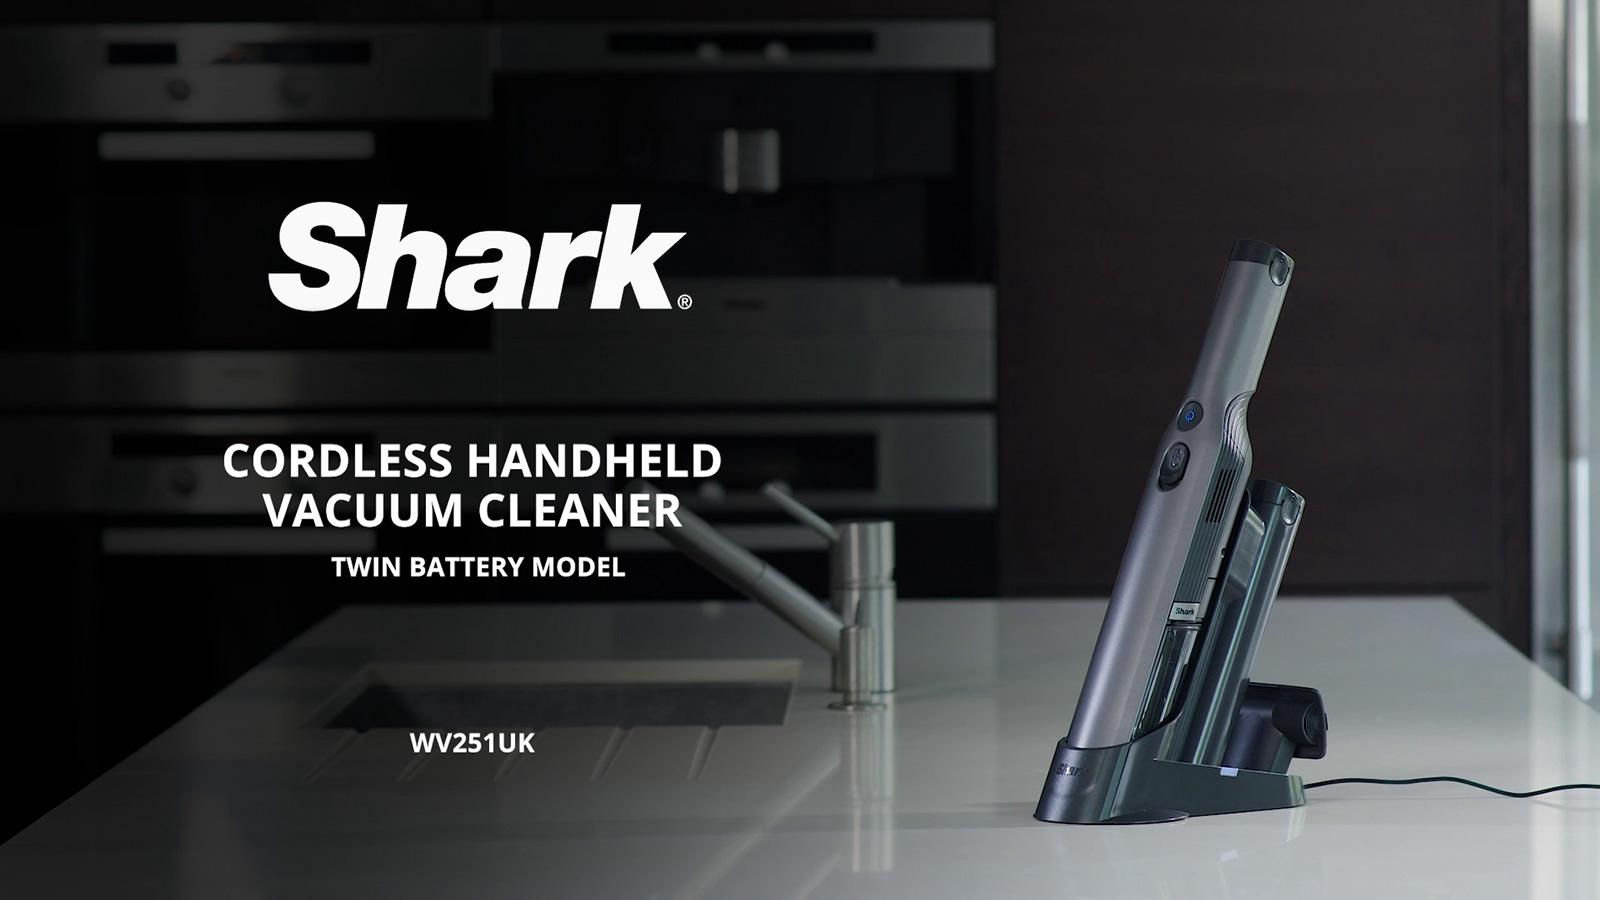 Shark Cordless Handheld Vacuum Cleaner Twin Battery